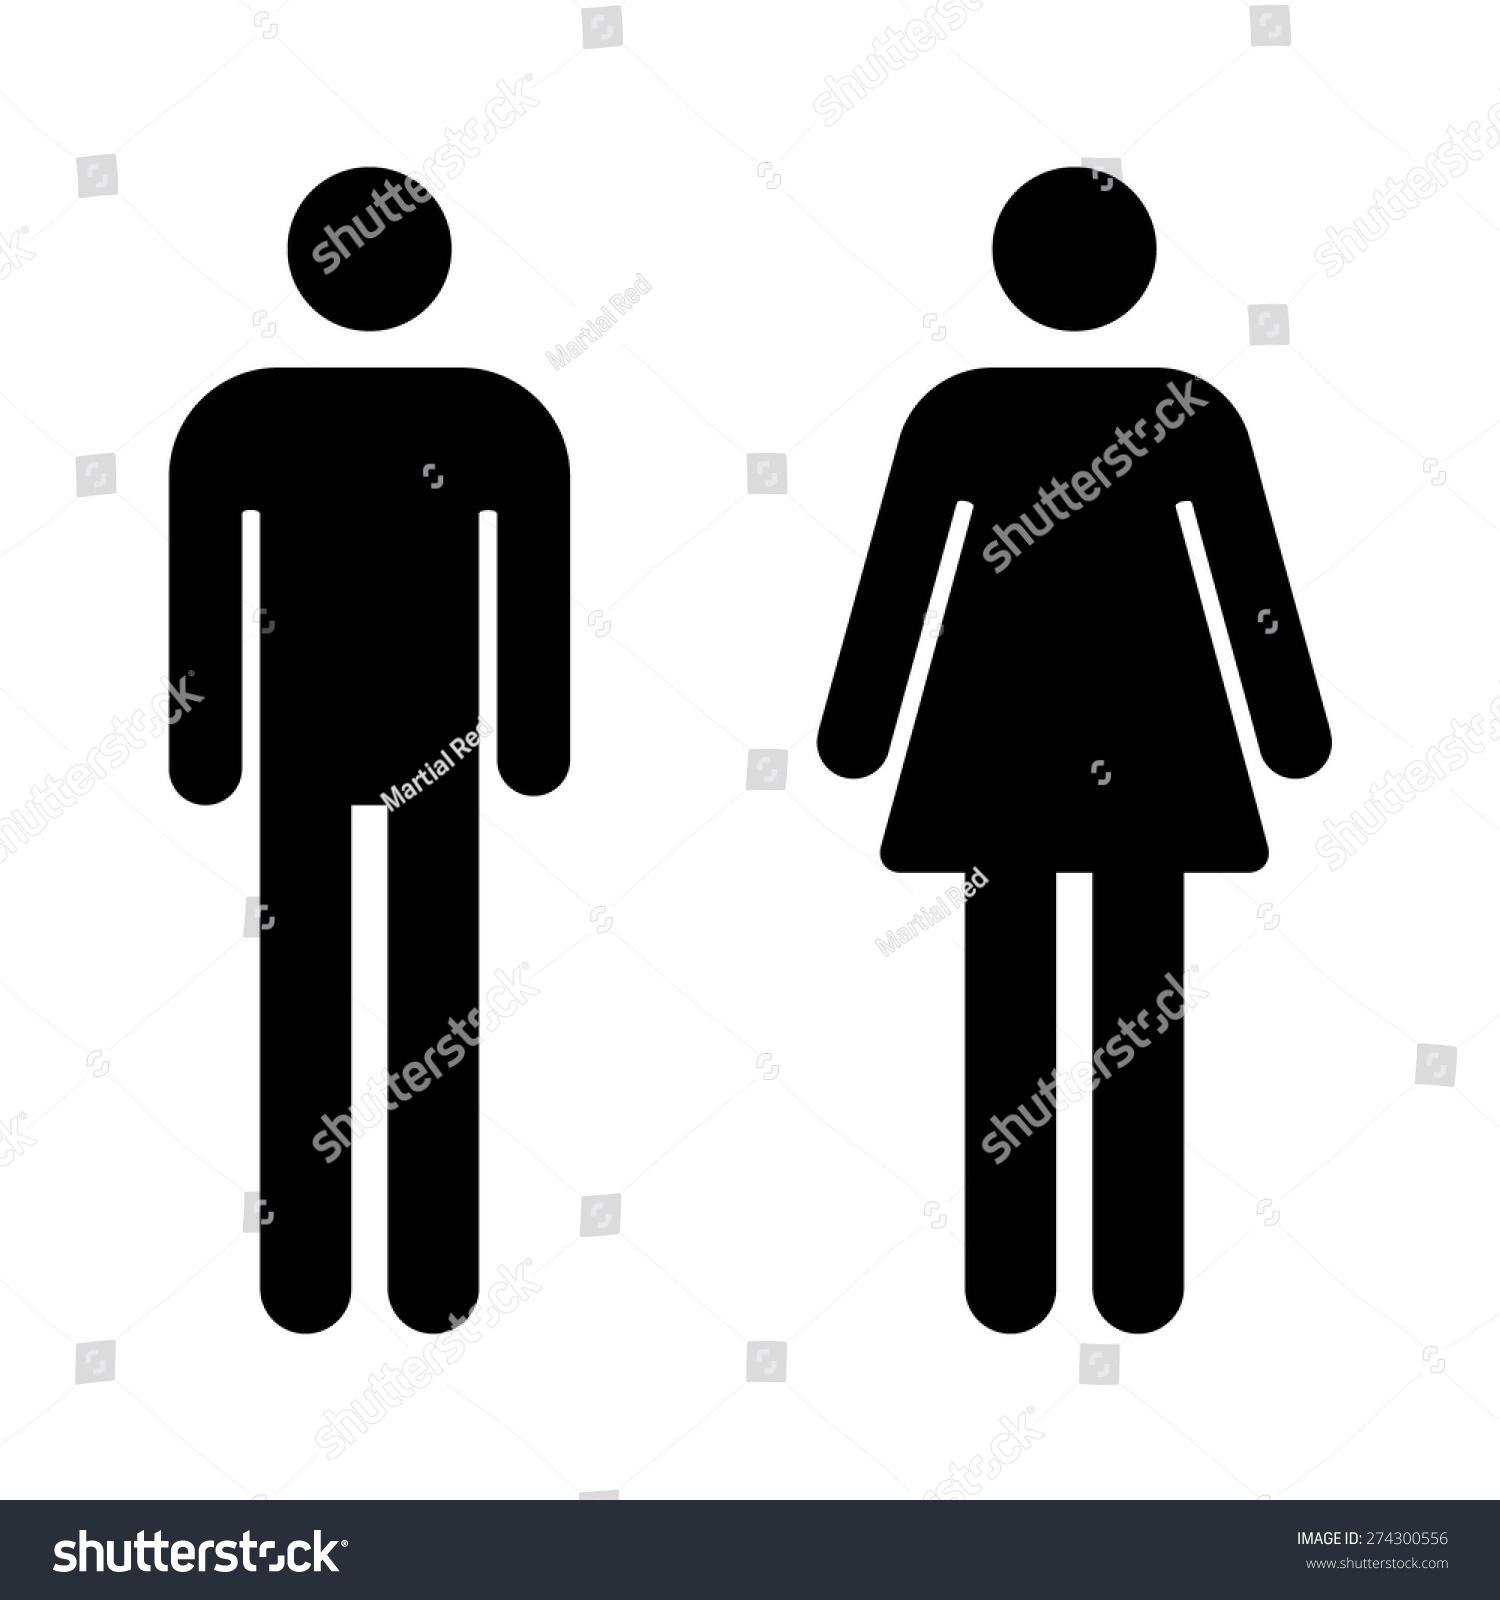 Male Female Bathroom Restroom Sign Flat Stock Vector (Royalty Free ...